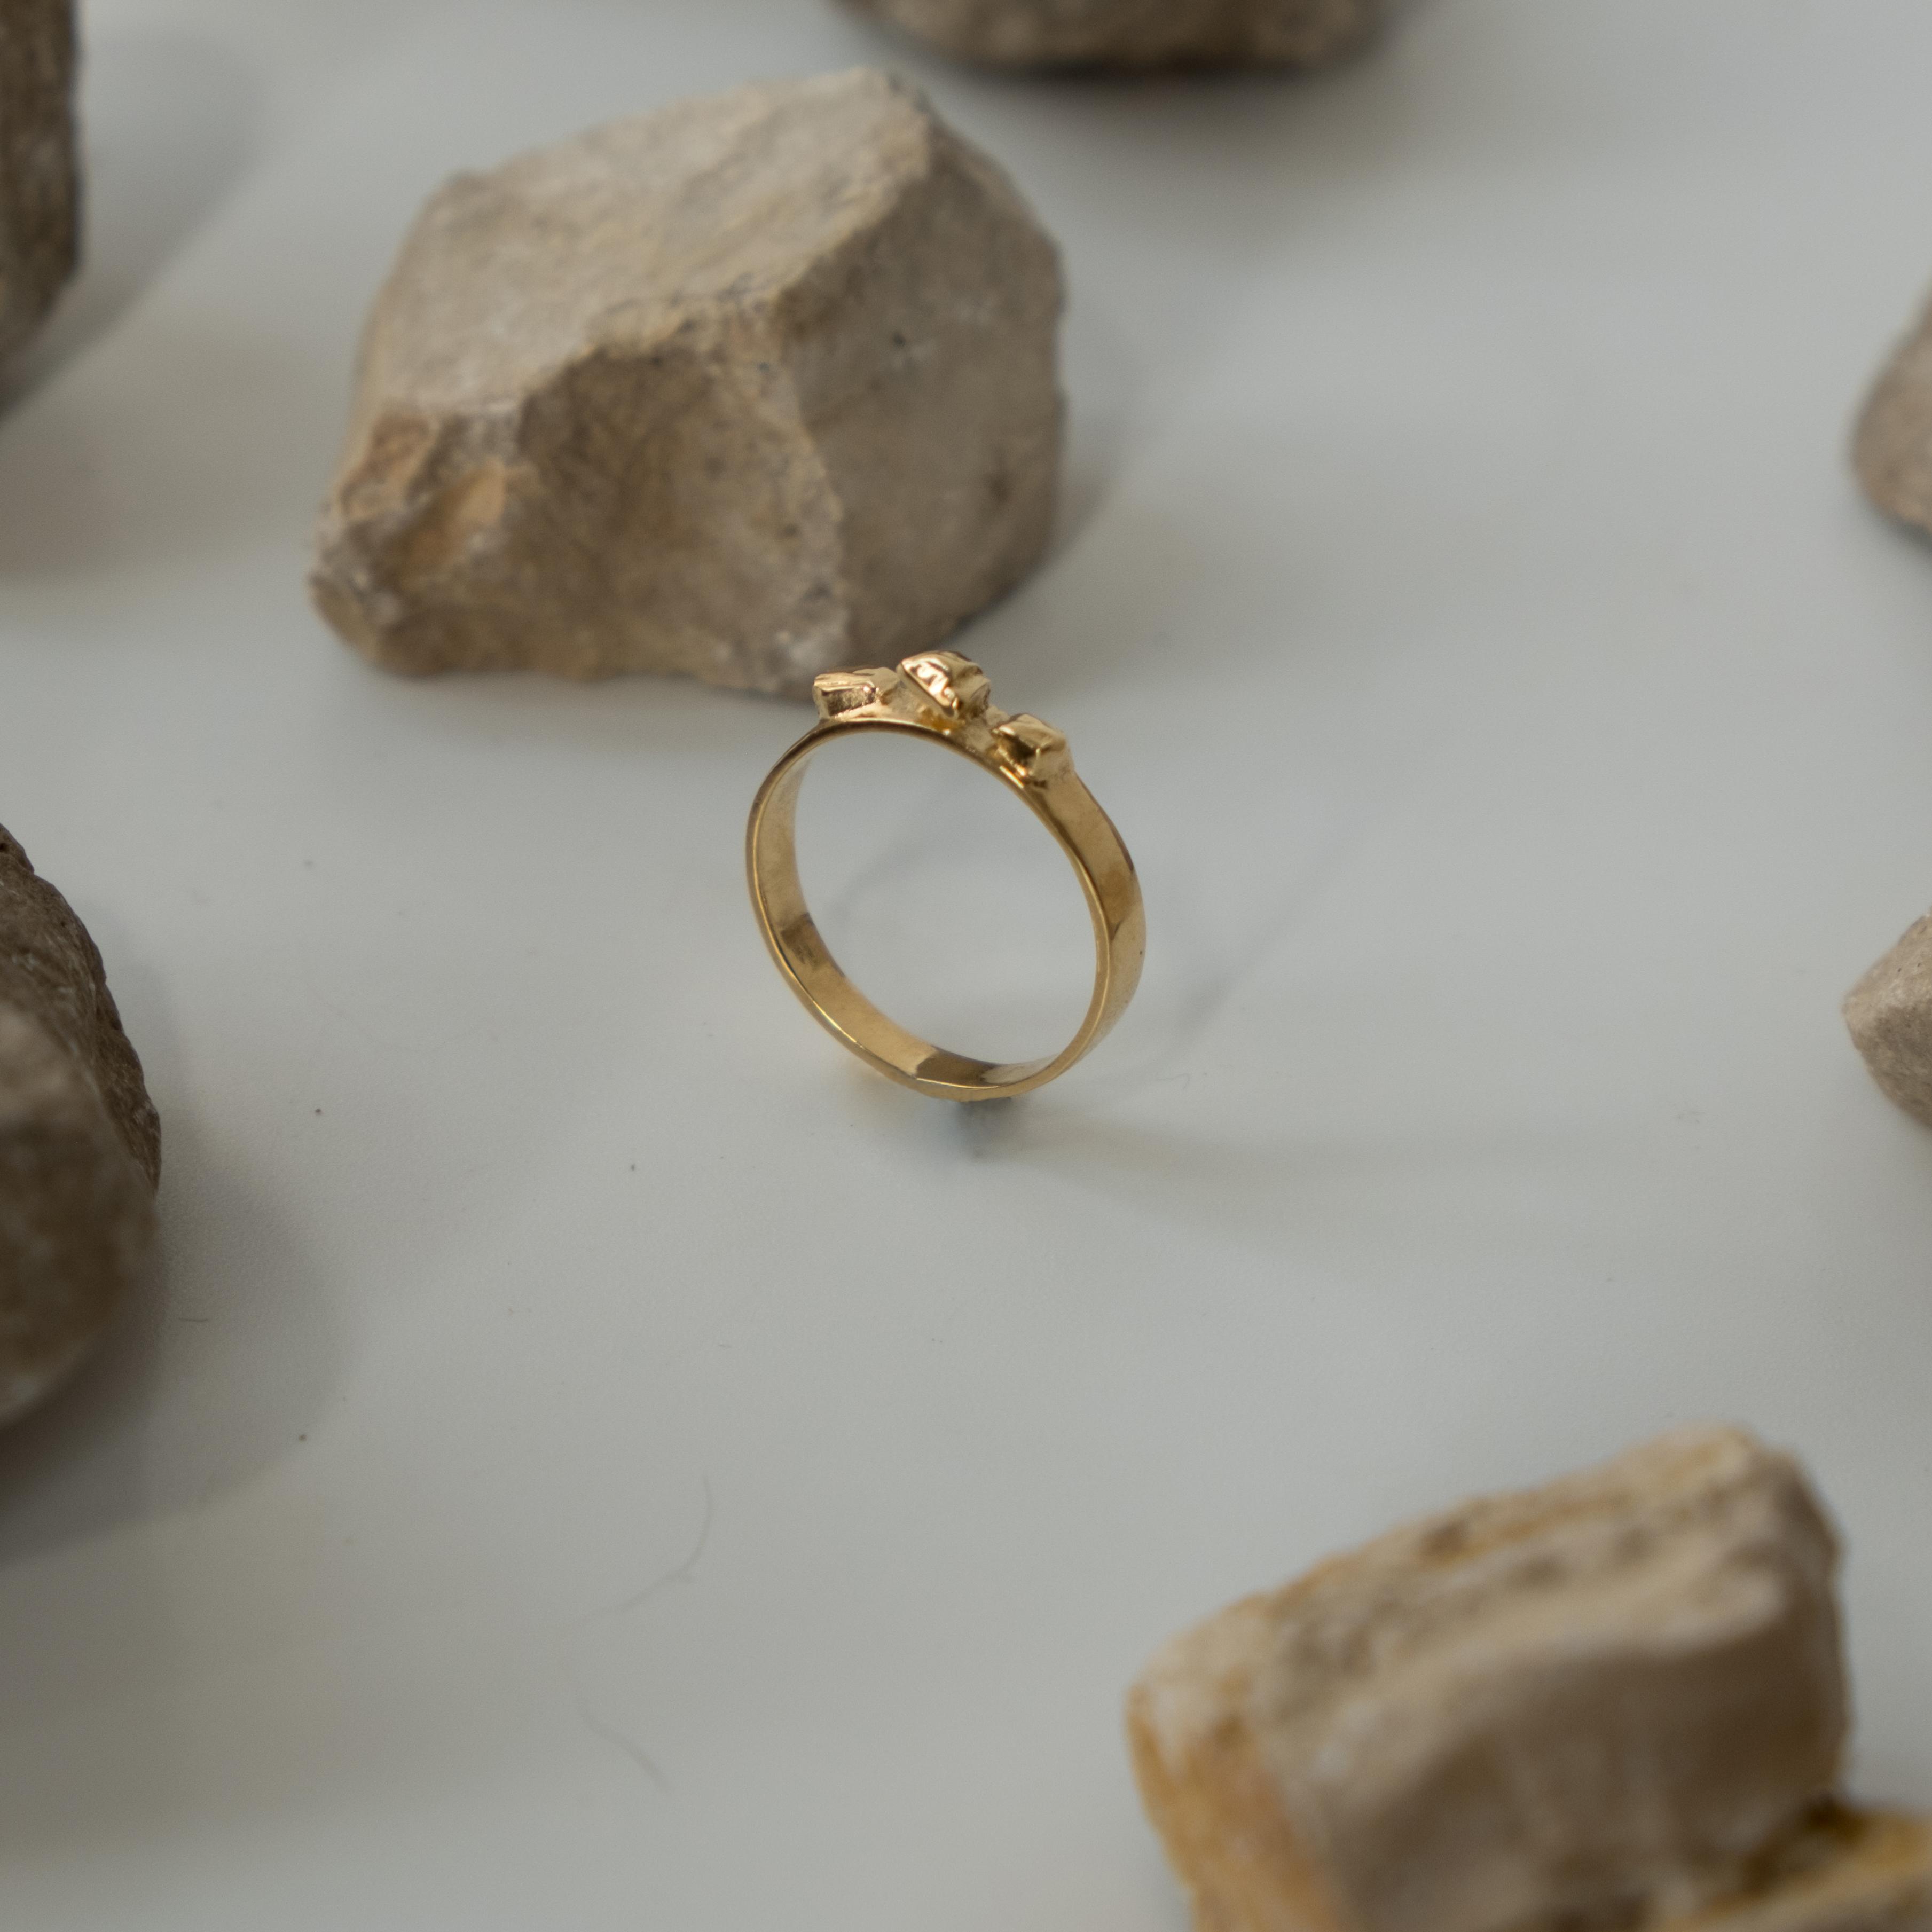 Argon 9K Gold Ring